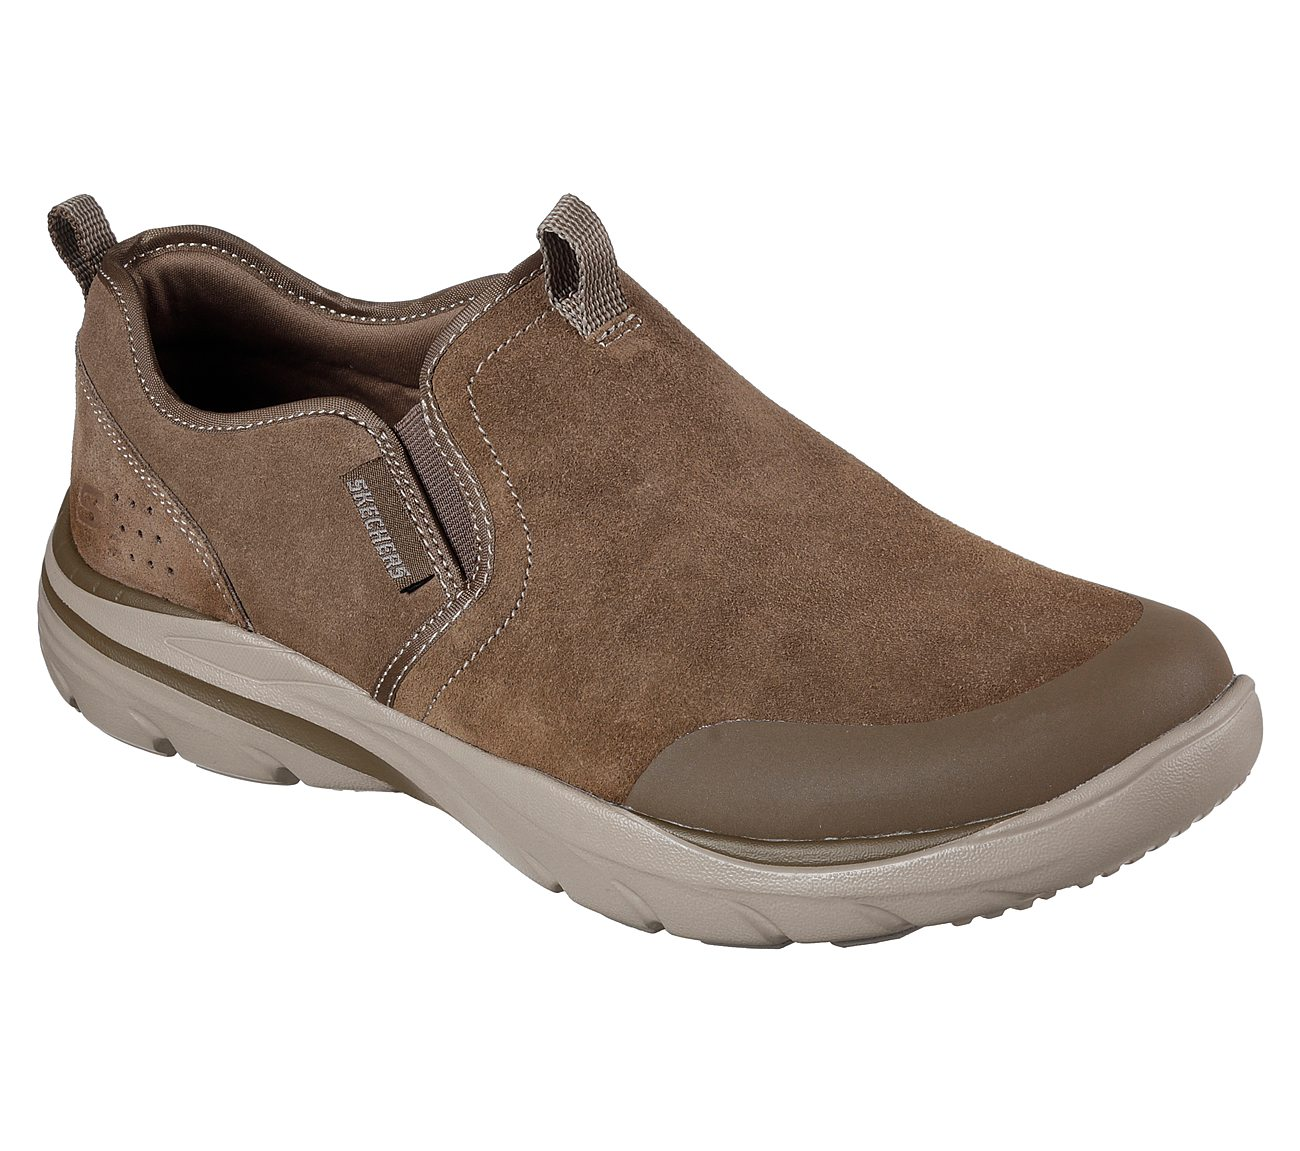 65236 Men's Corven - Venson Relaxed Fit Shoe Tan - 8.5